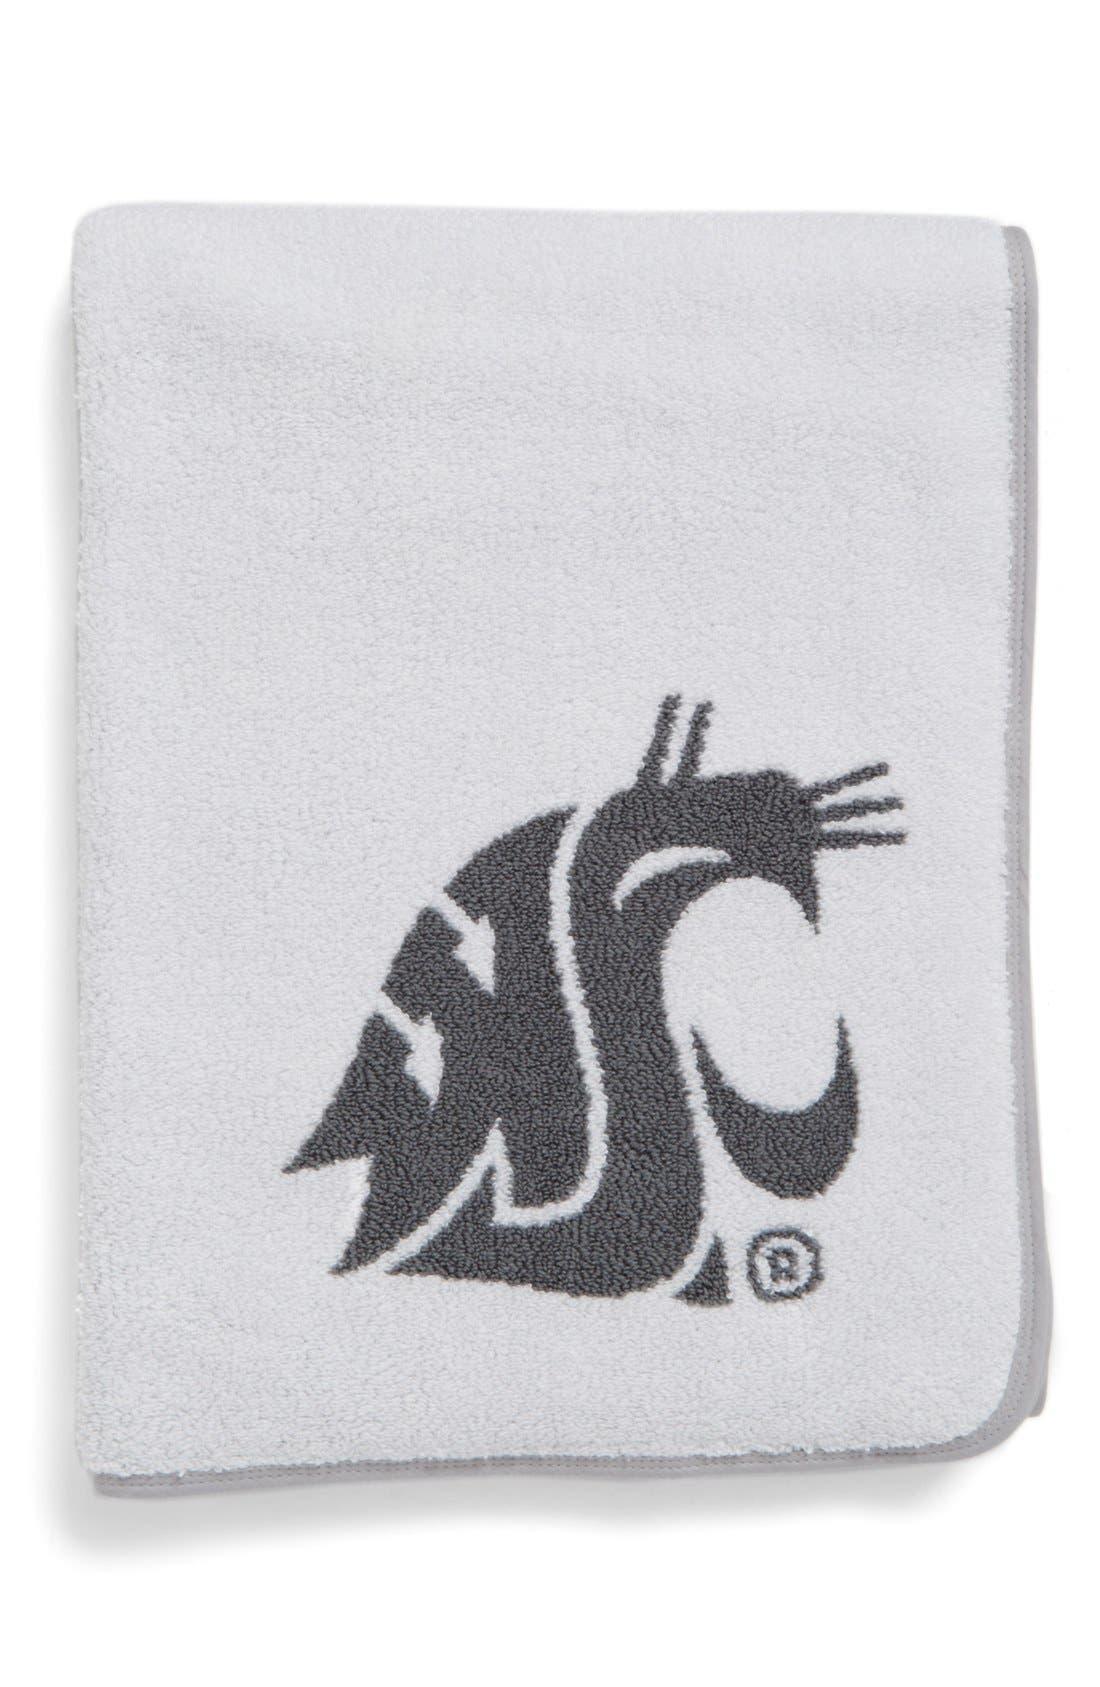 ANGOCHA 'College Pride' Bath Towel